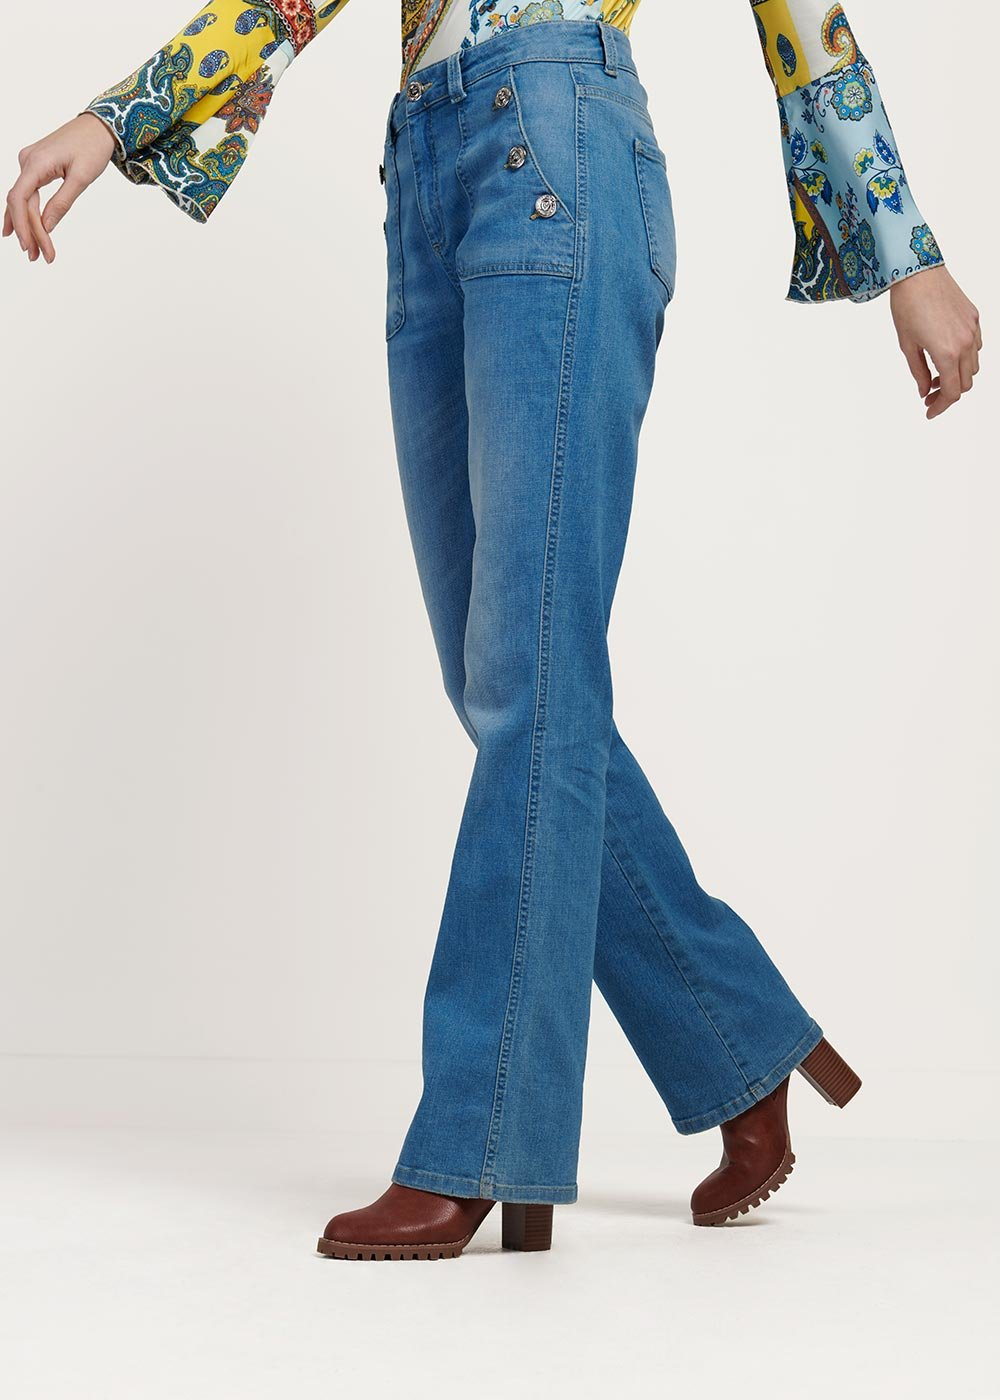 Dotty denim with front pockets detail - Denim - Woman